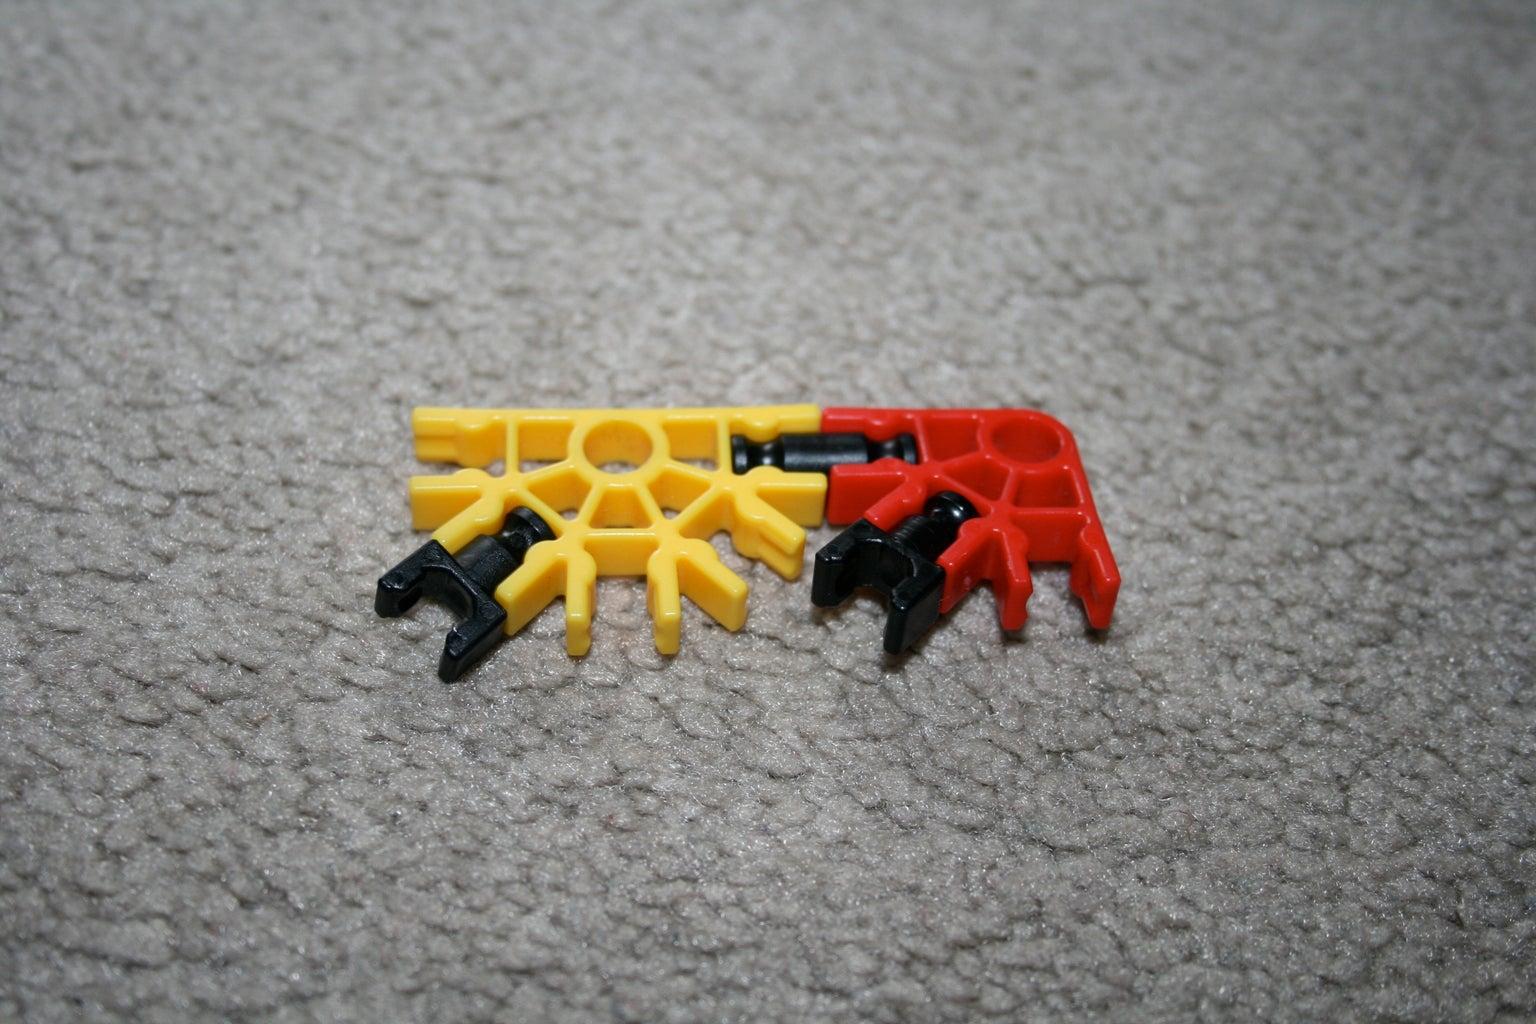 The Main Gun